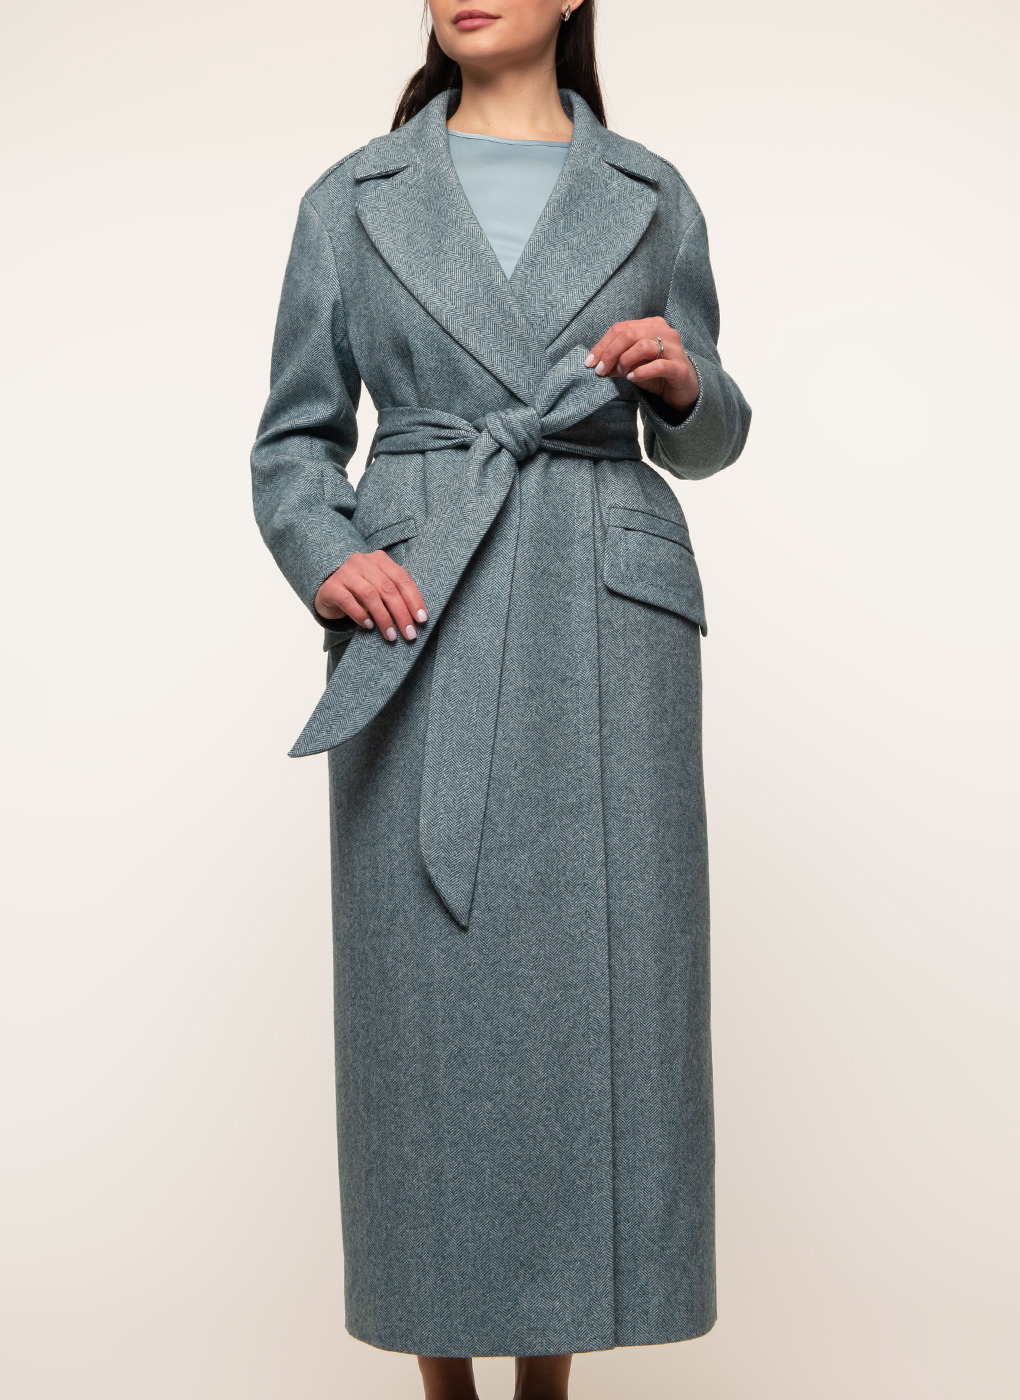 Пальто полушерстяное 45, Sezalto фото